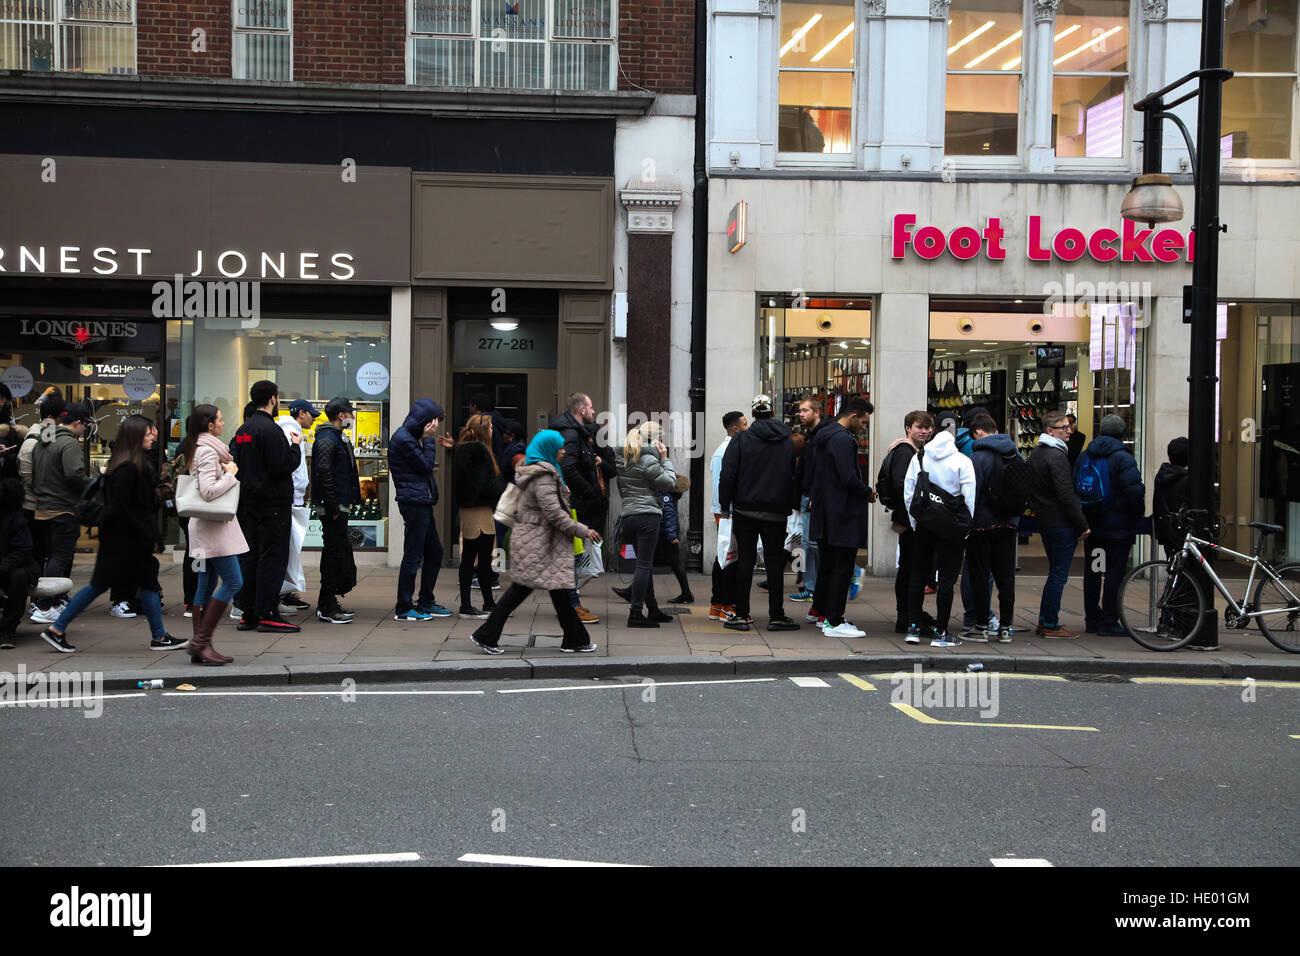 Foot Locker Store Stock Photos Amp Foot Locker Store Stock